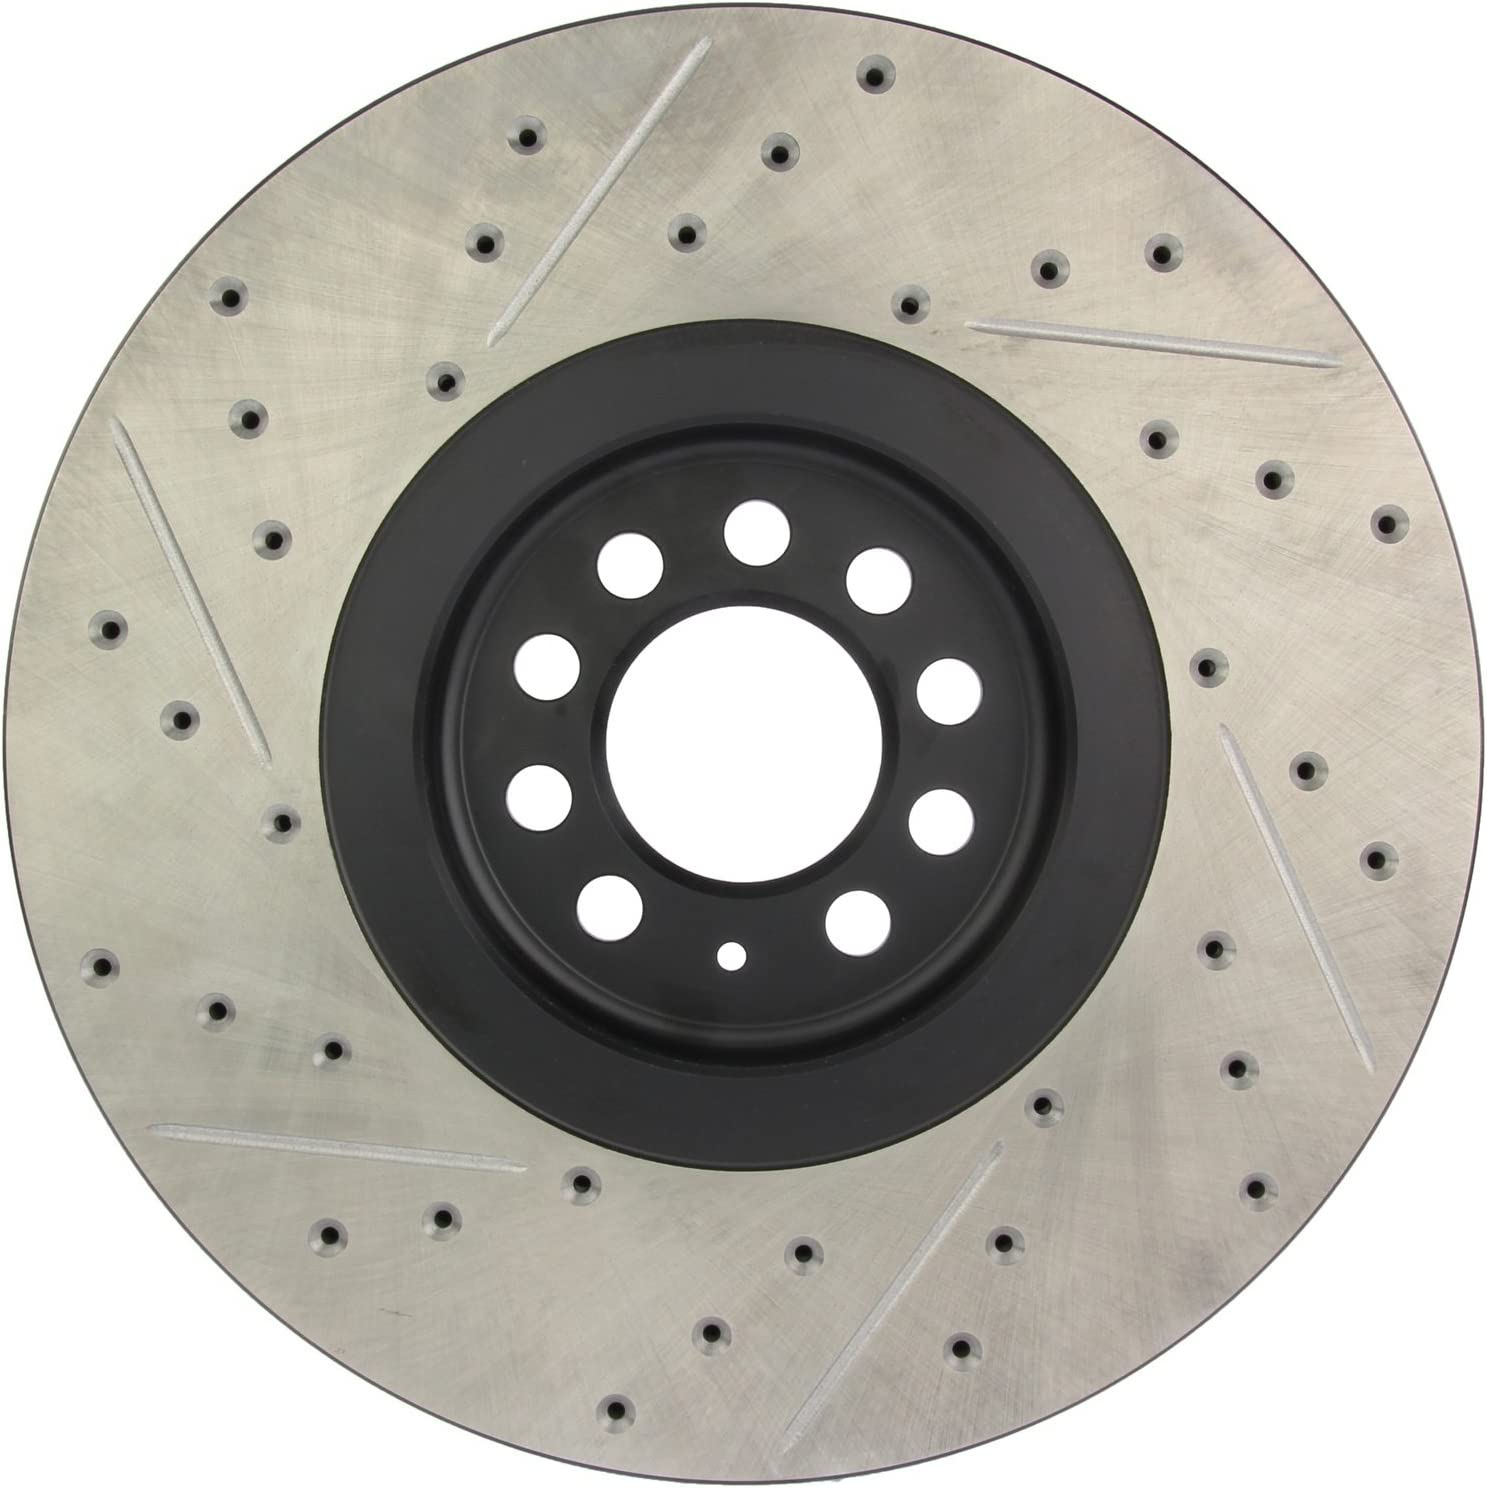 StopTech 127.33094L Sport Drilled 激安特価品 Slotted お得クーポン発行中 Front Lef Rotor Brake